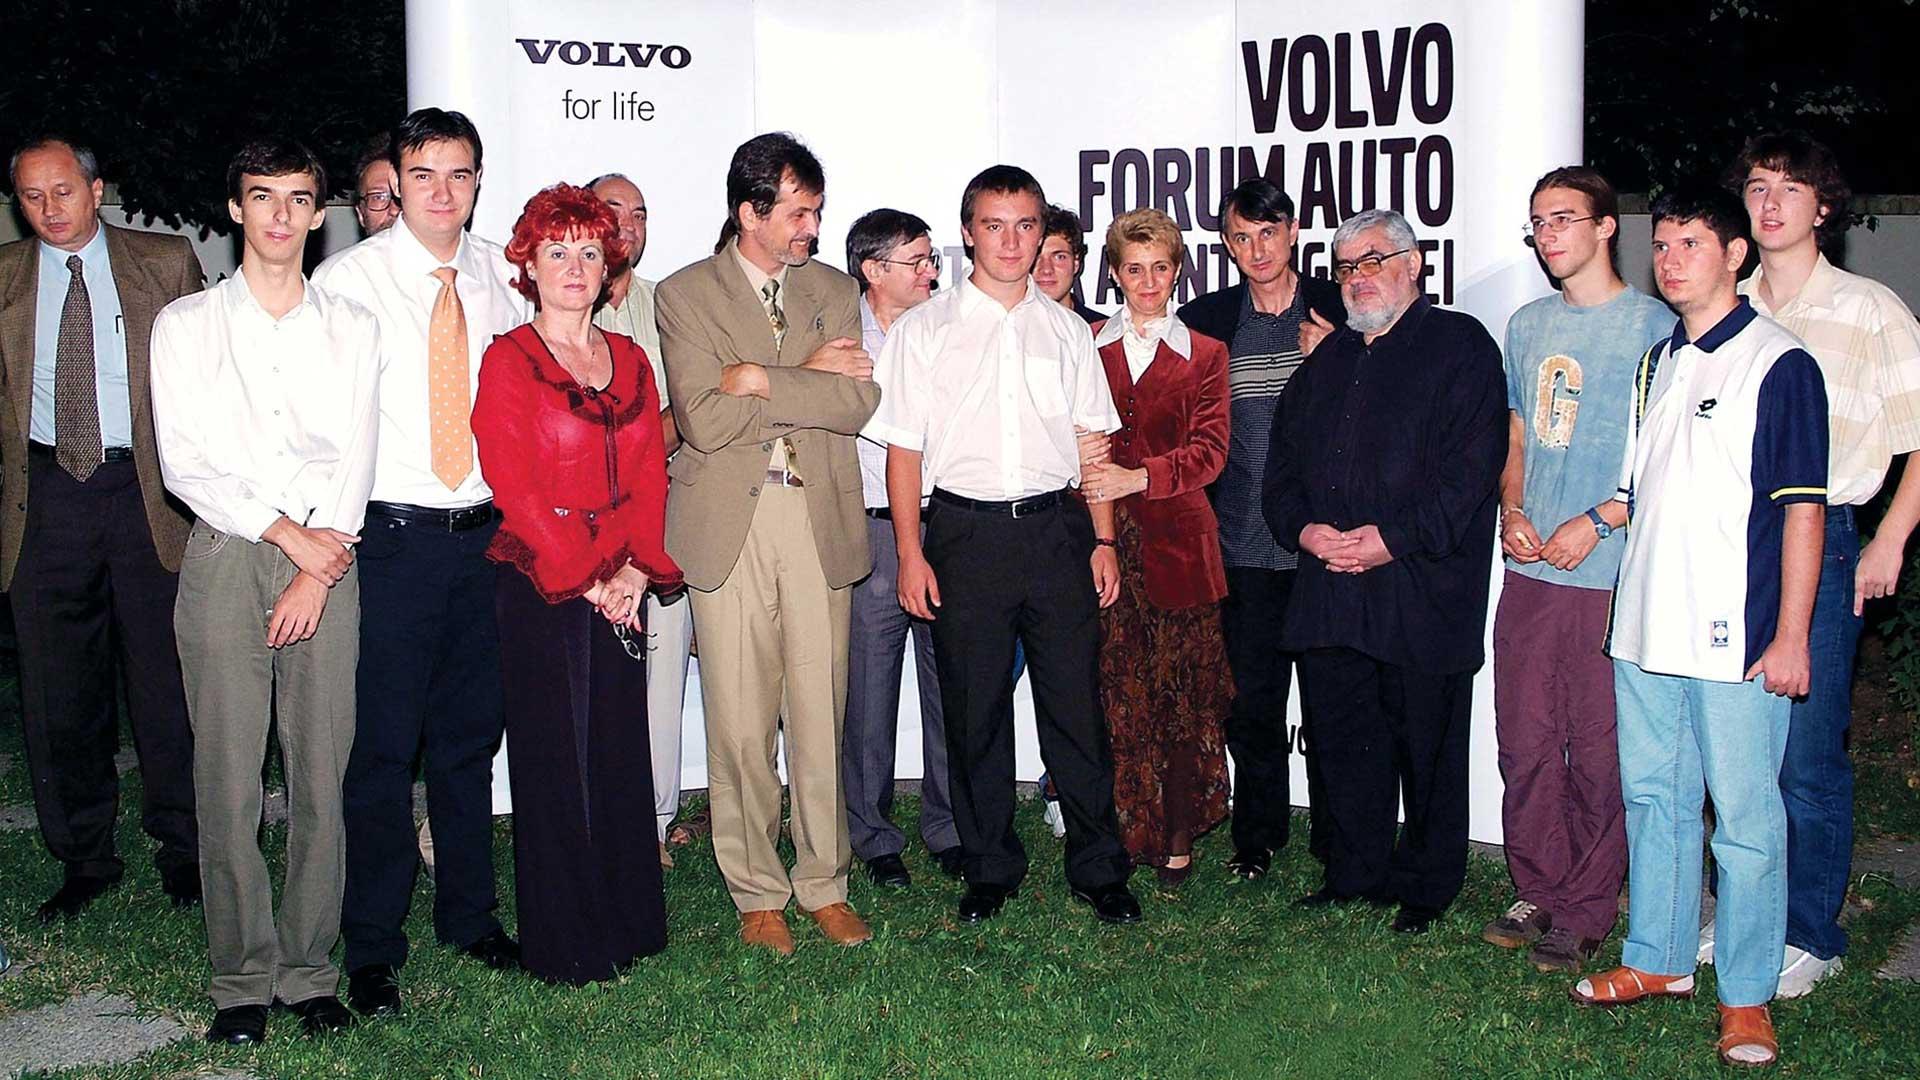 De la Dilema veche la Volvo și înapoi…